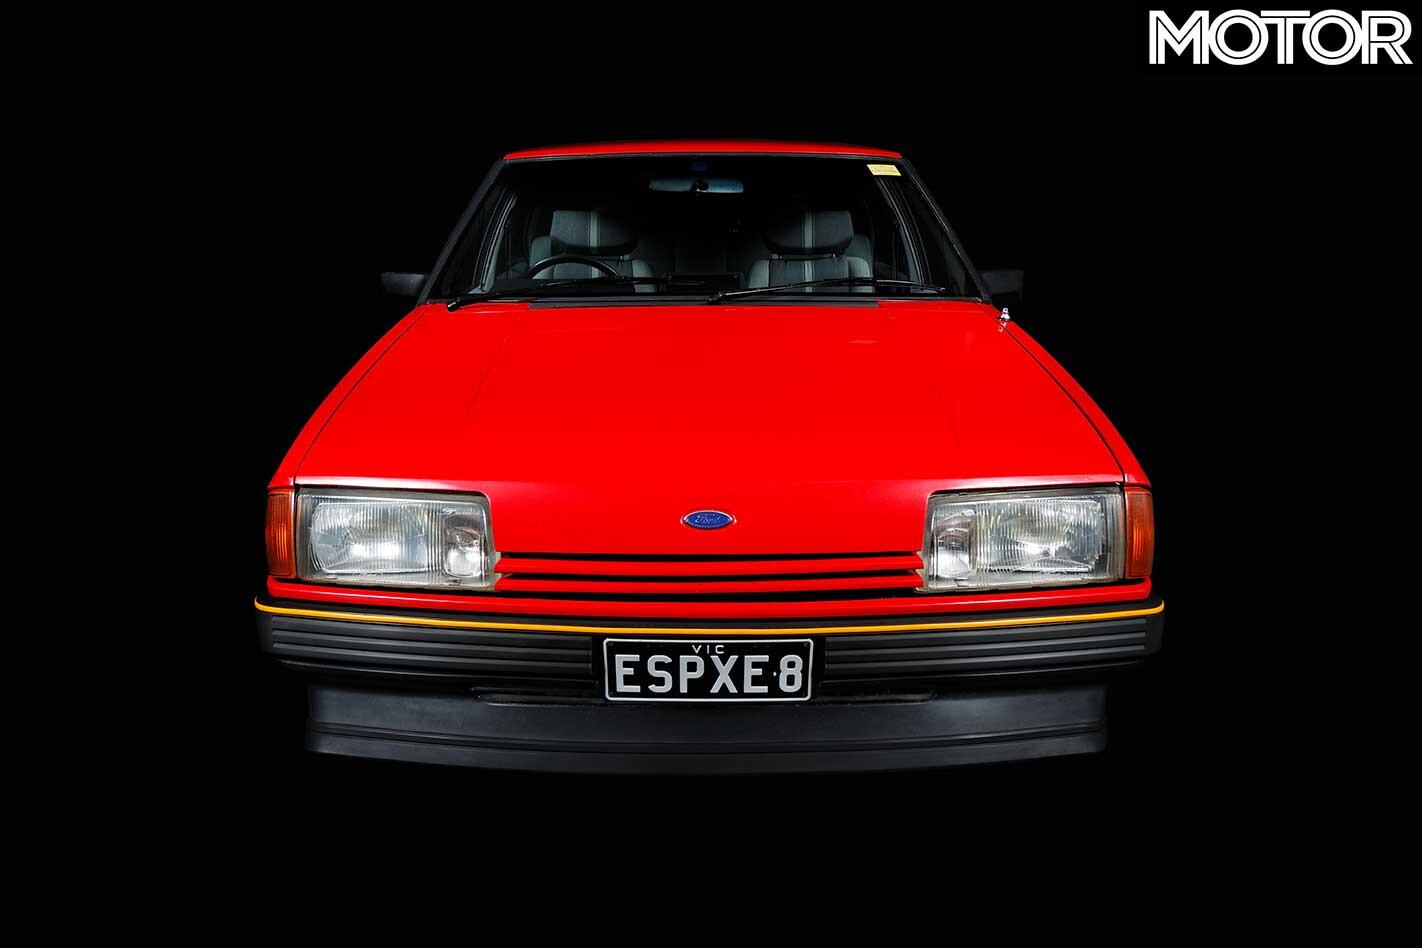 1982 Ford Falcon XE ESP Front Headlights Jpg